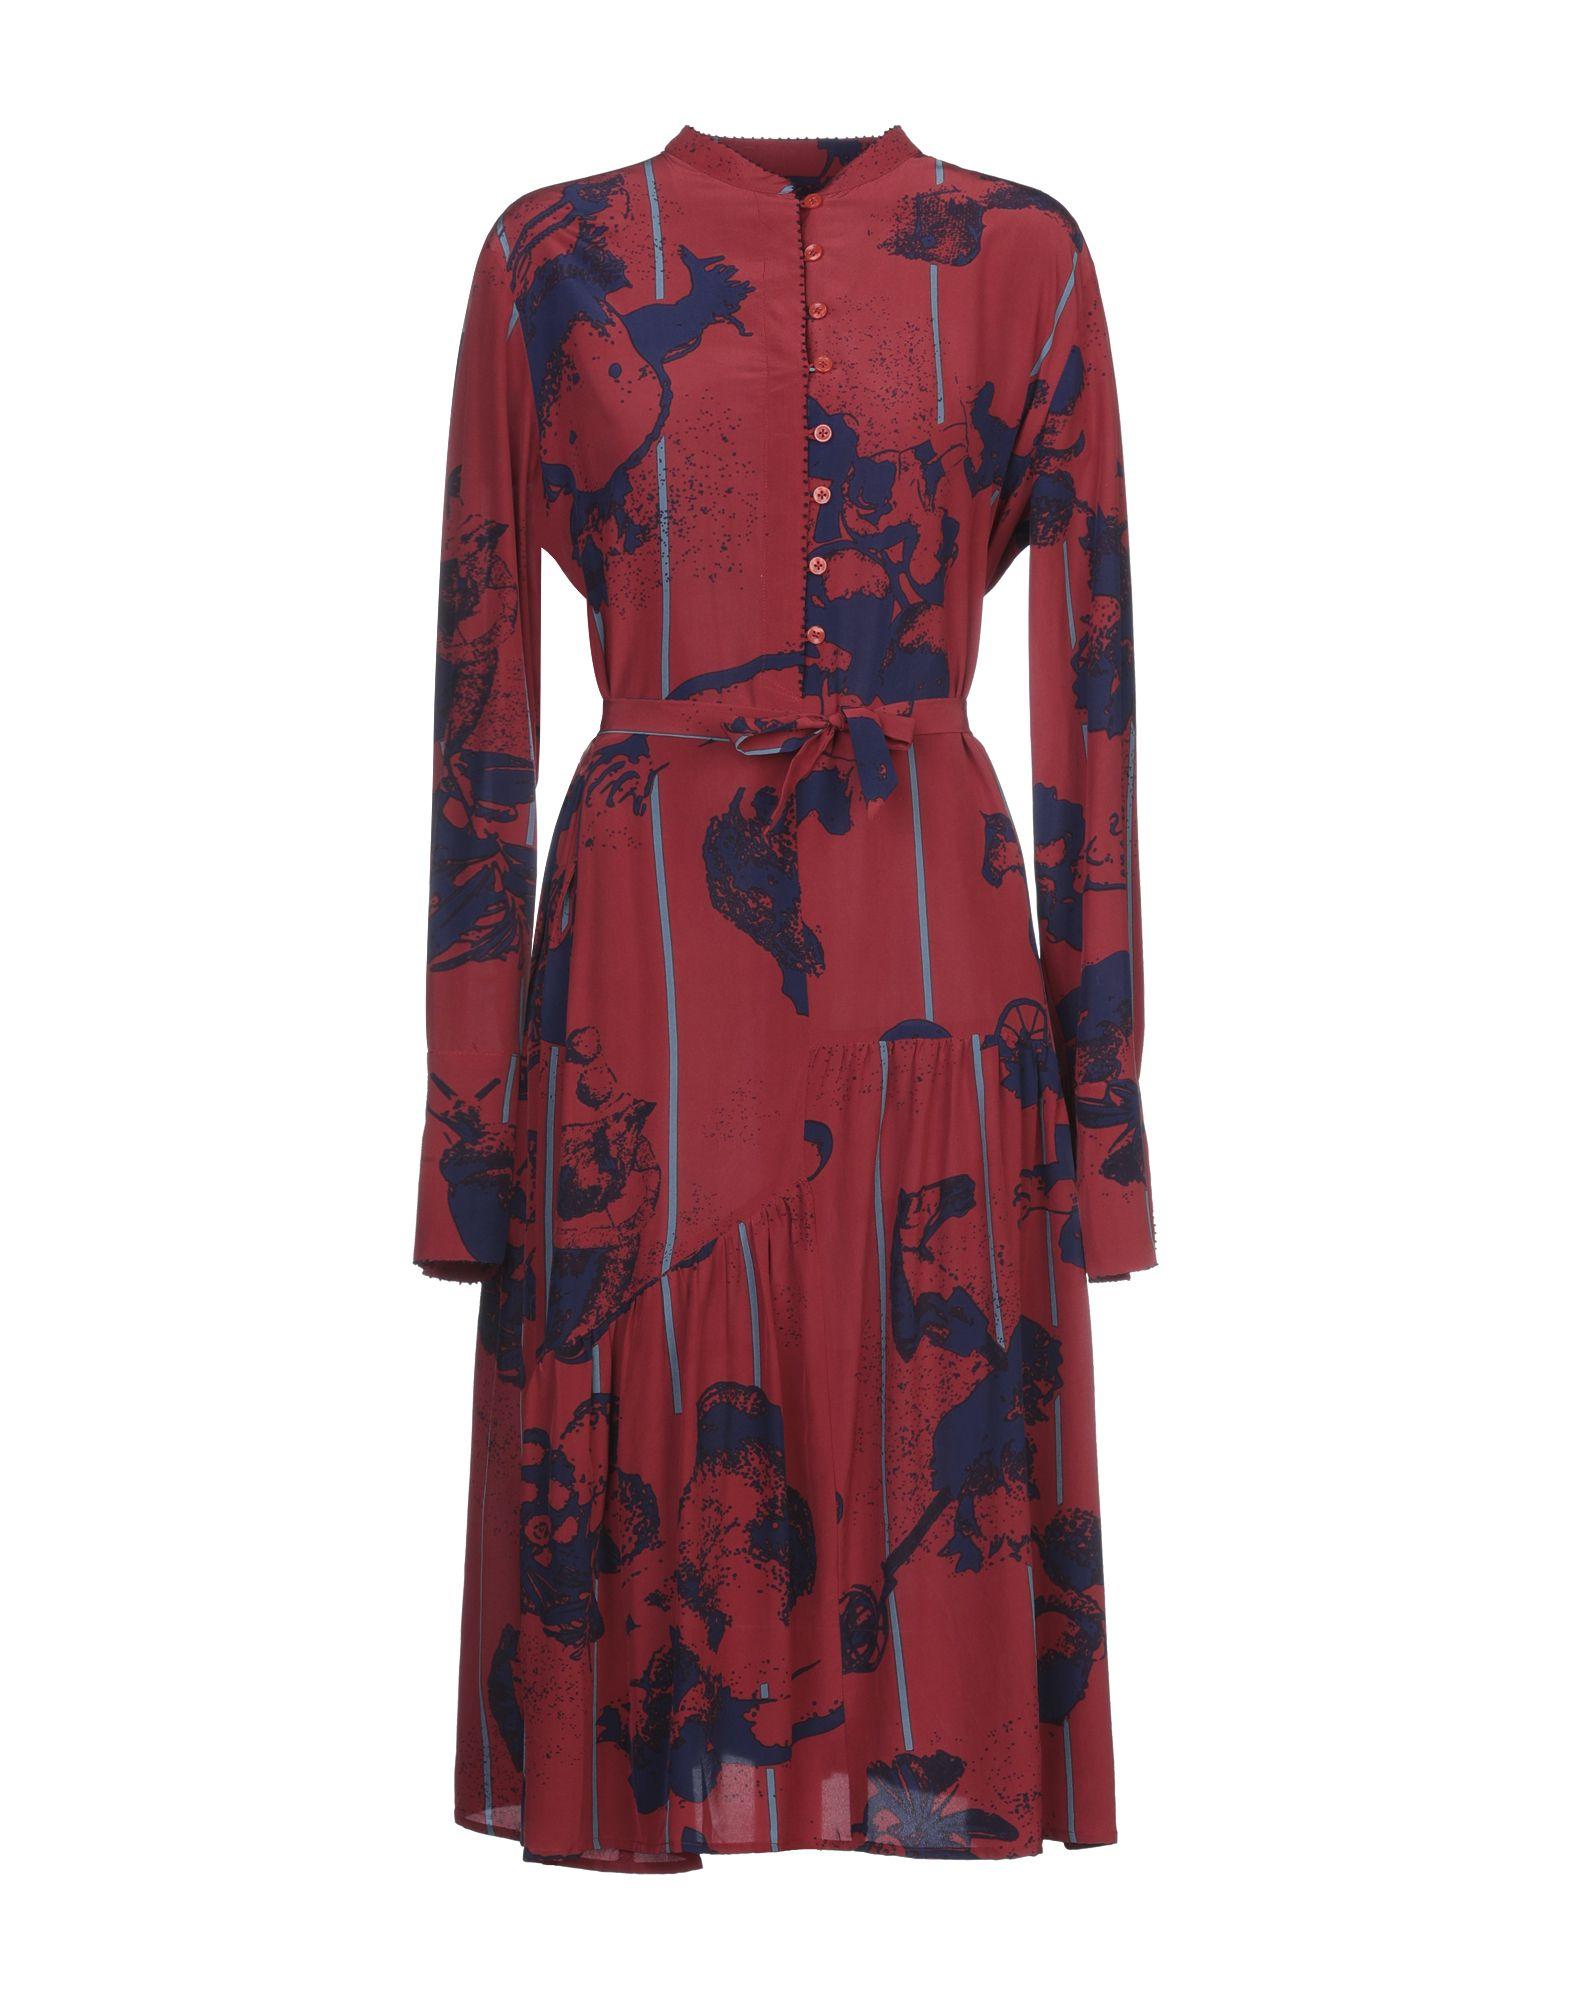 AN AN LONDREE Платье длиной 3/4